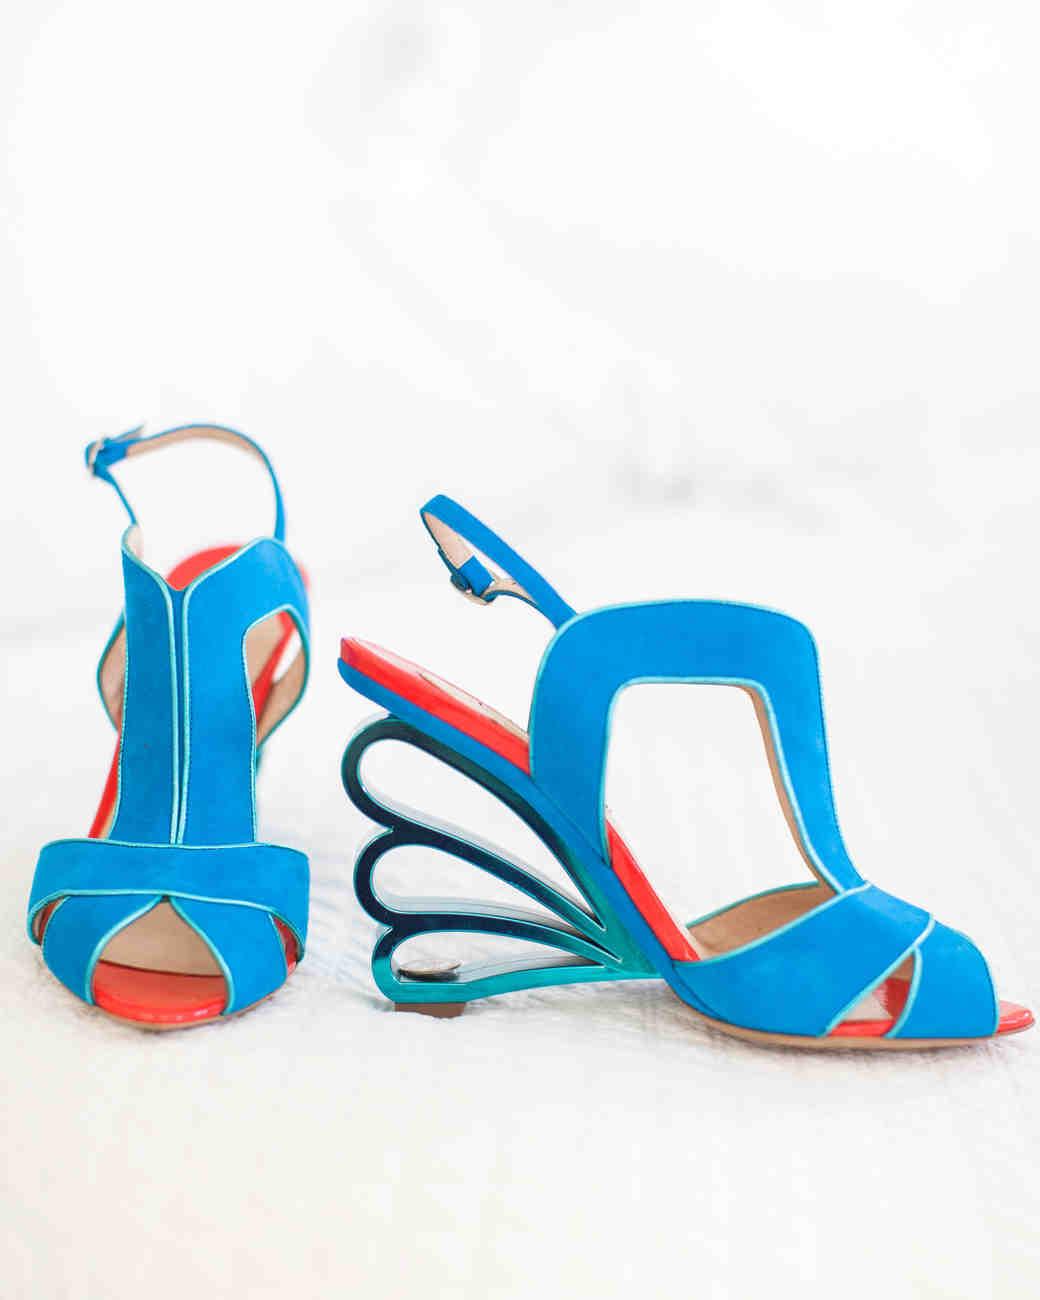 samantha-peter-wedding-shoes-0314.jpg